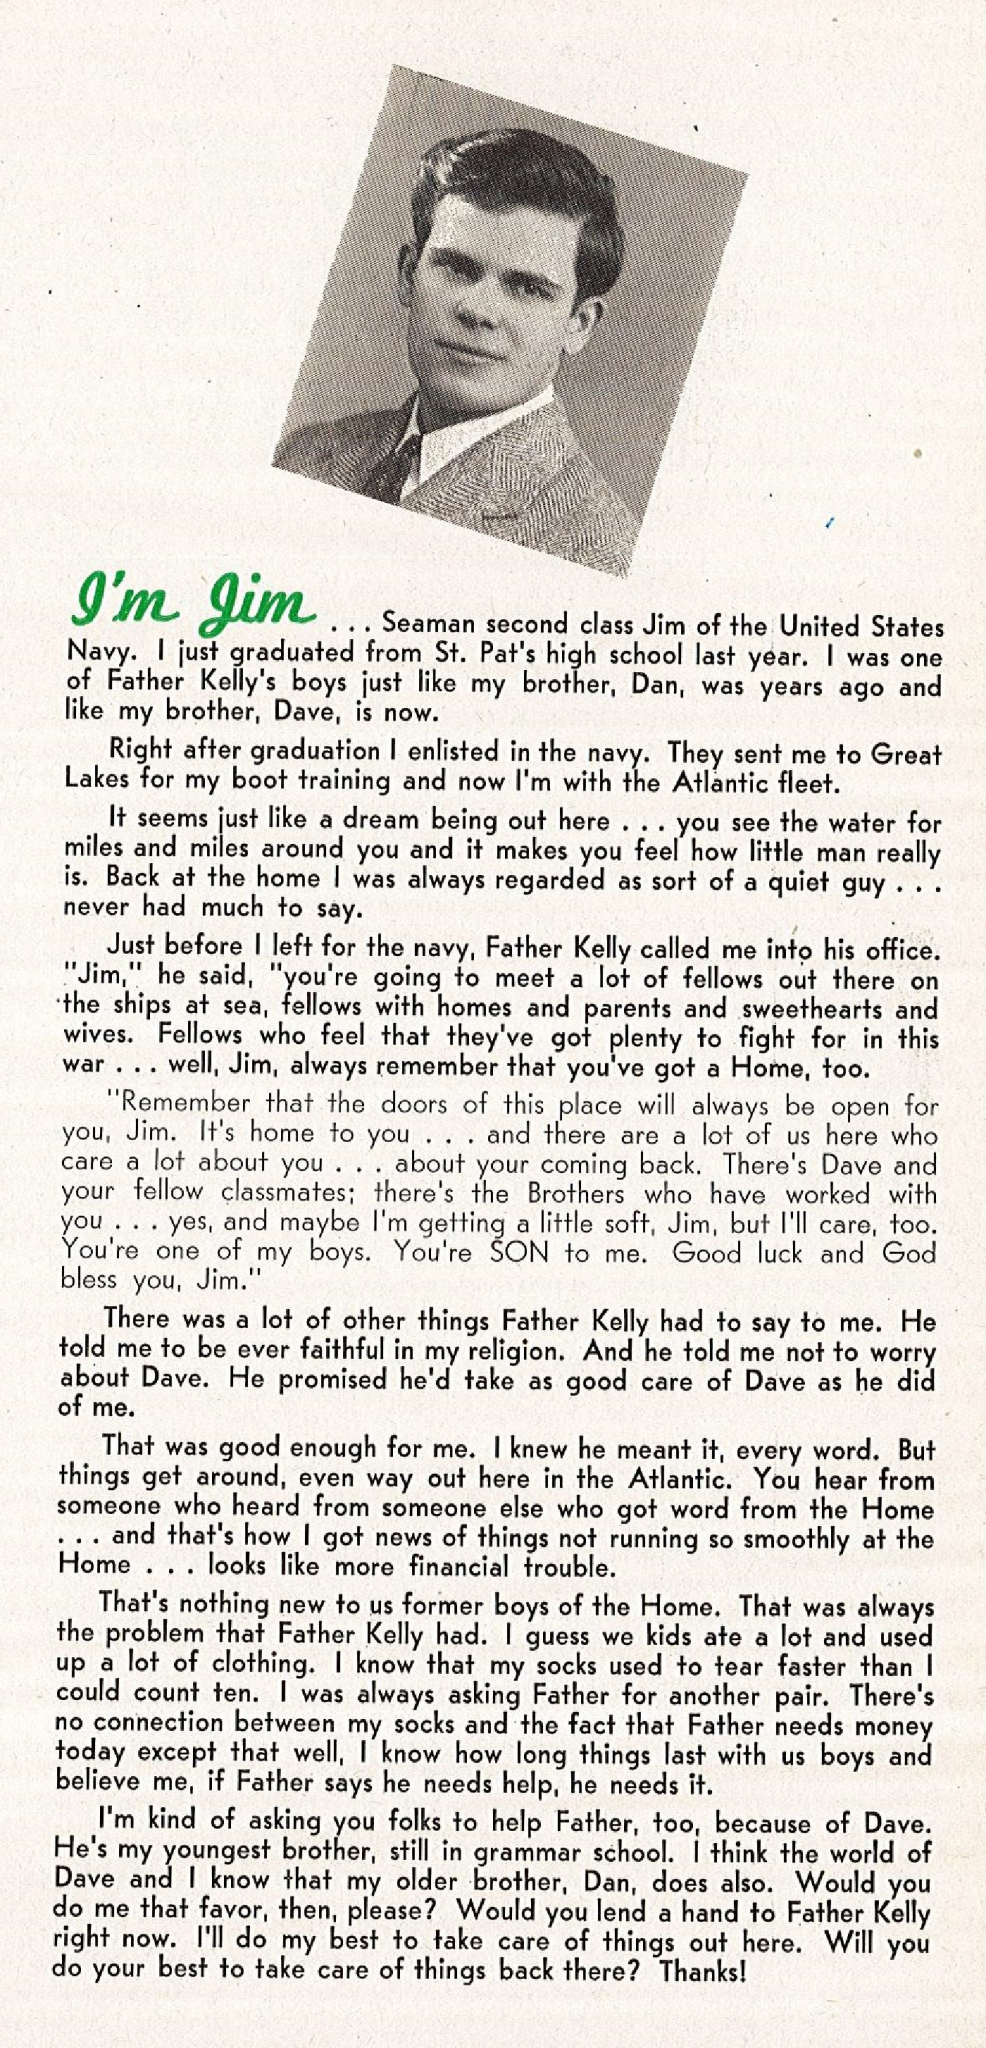 Jim's letter